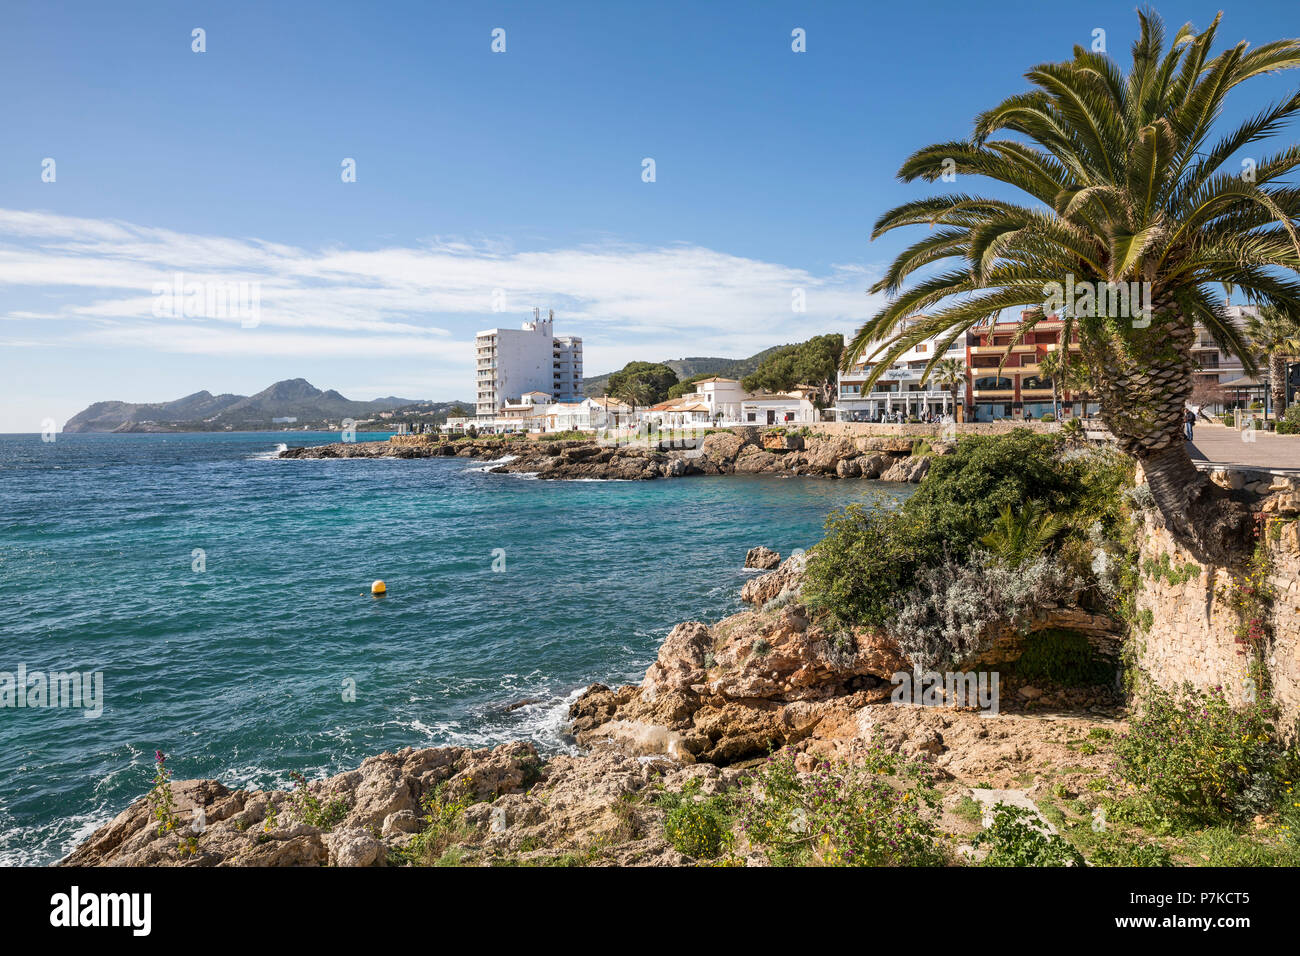 Coast in Cala Ratjada, Mallorca, Balearic Islands, Spain - Stock Image